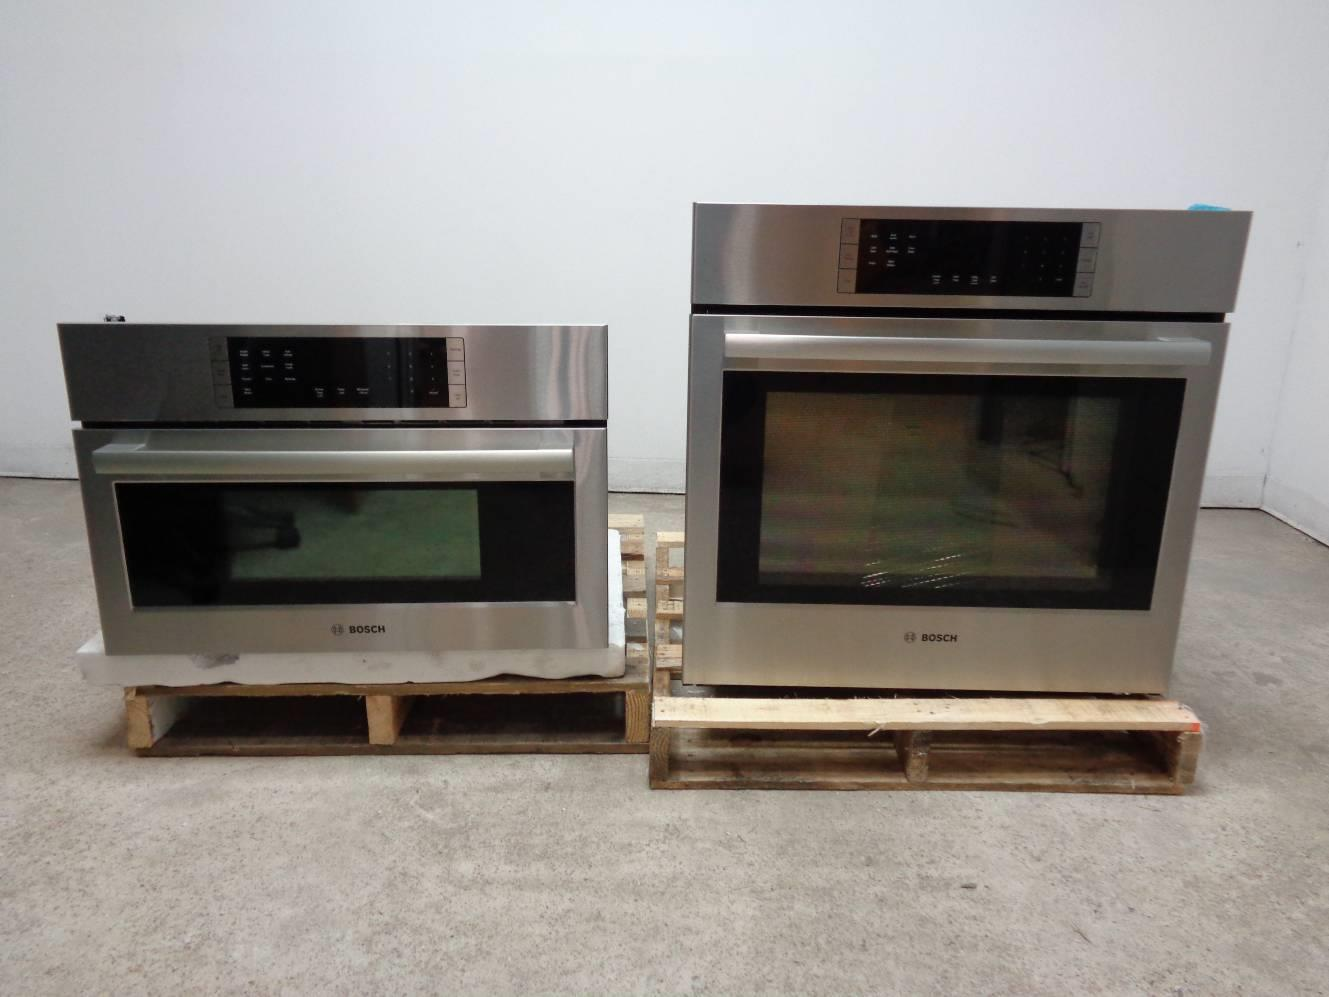 bosch hbl8450uc 800 series electric wall oven manual built